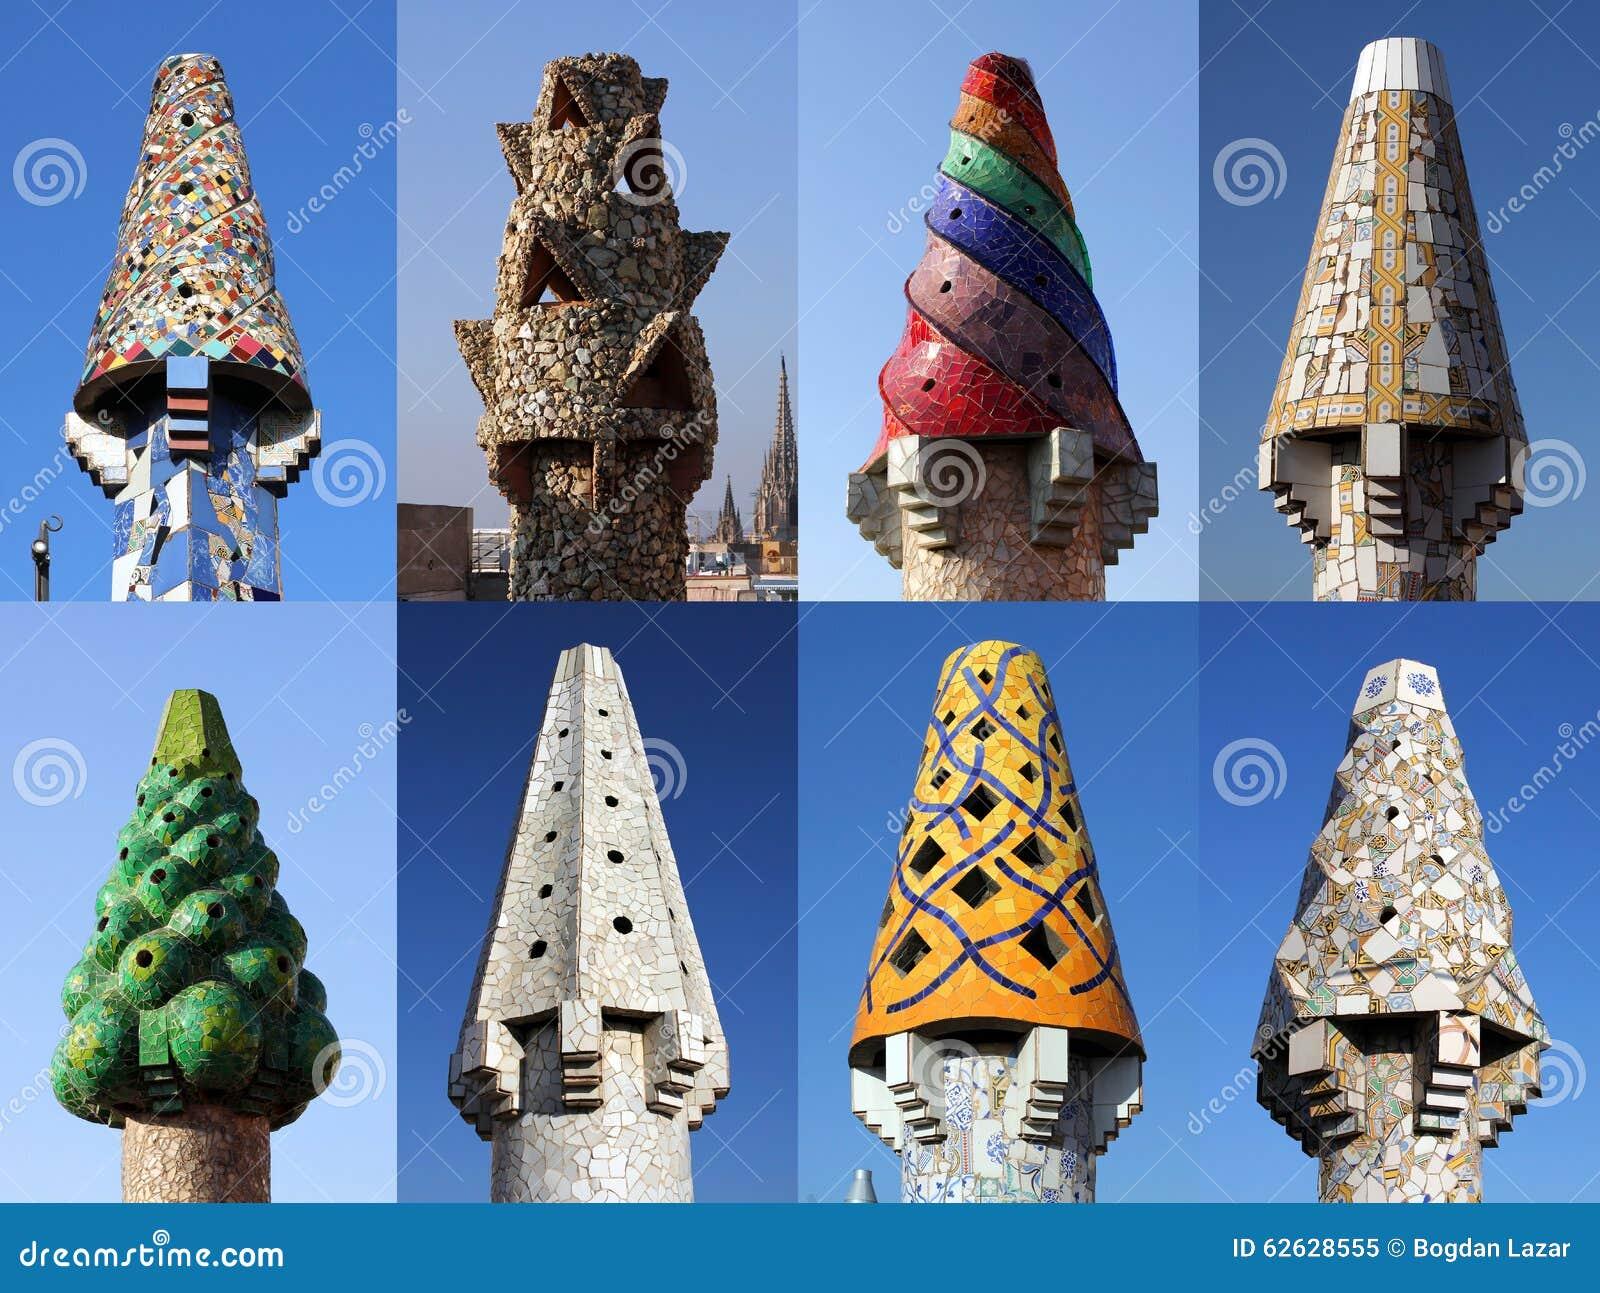 Chimeneas coloridas en palau guell barcelona imagen de archivo imagen de catalu a estilo - Chimeneas barcelona ...